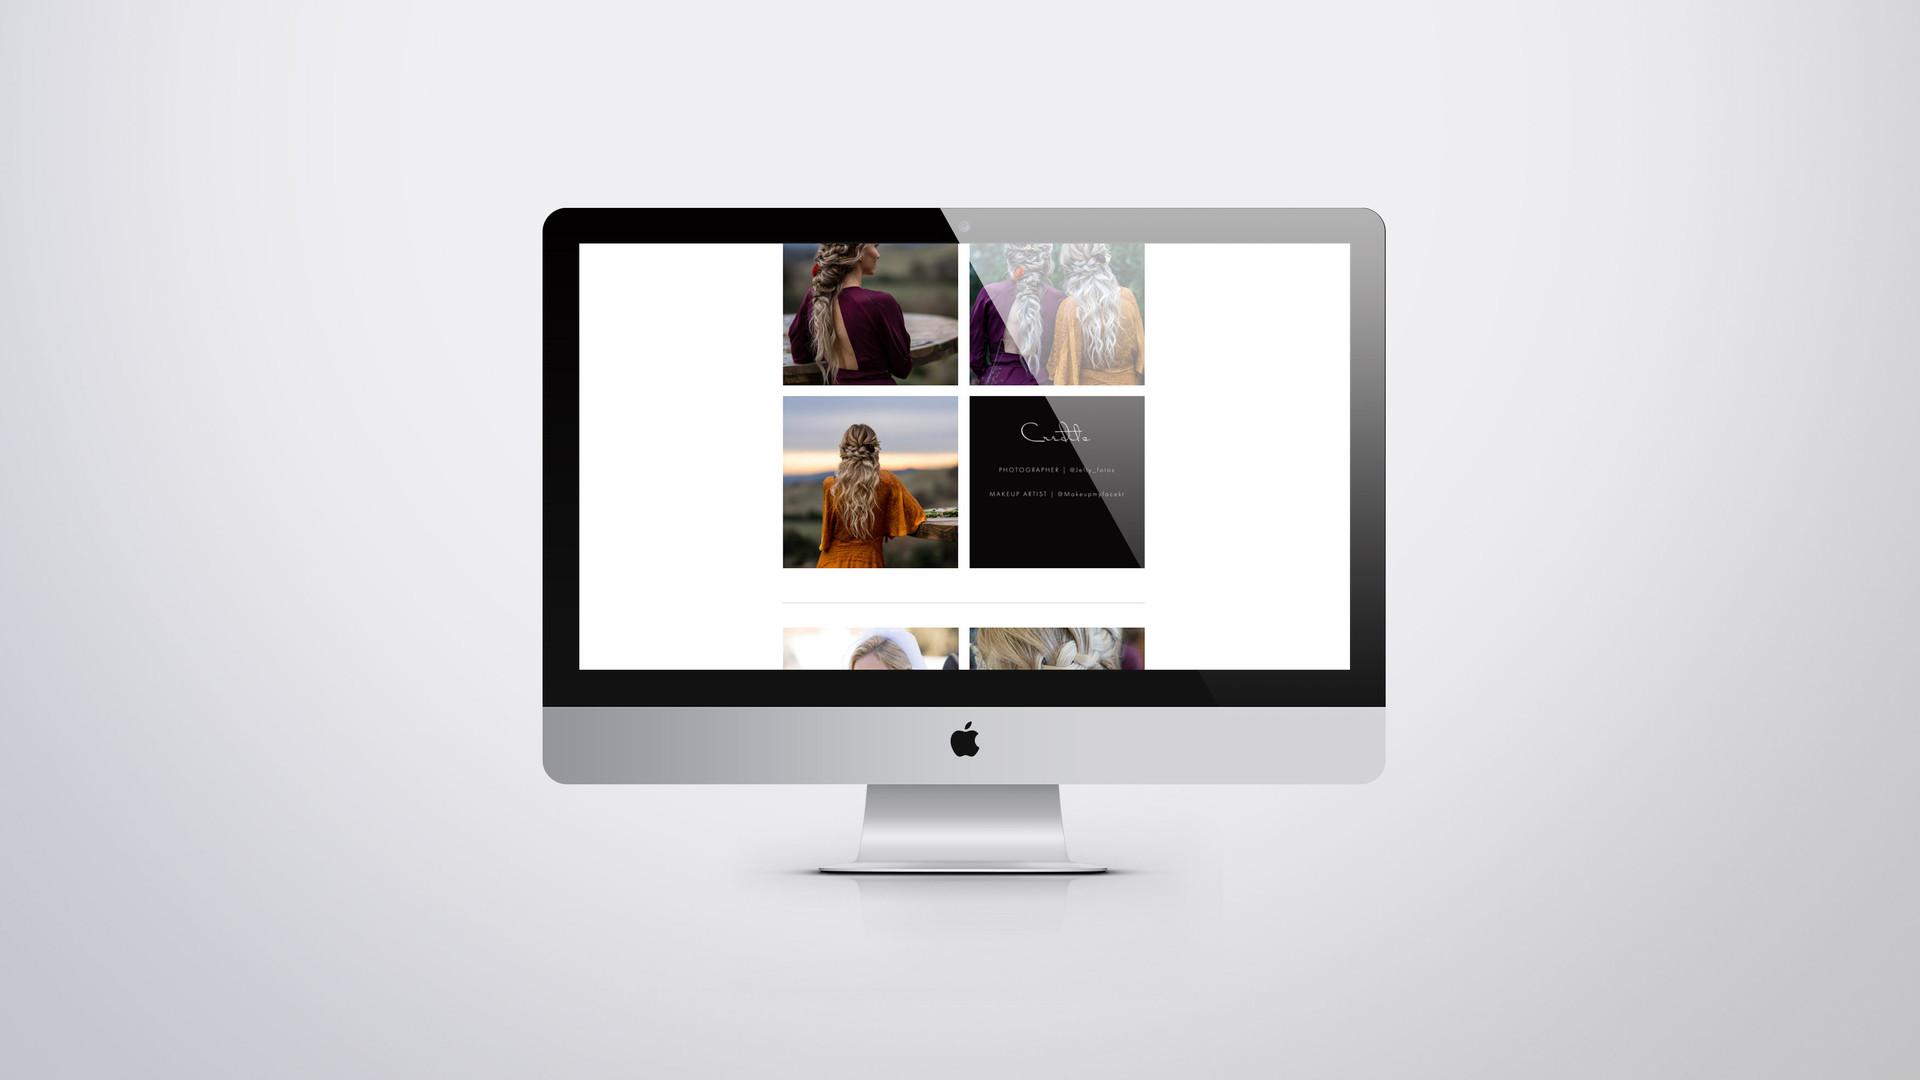 bb site 6.jpg